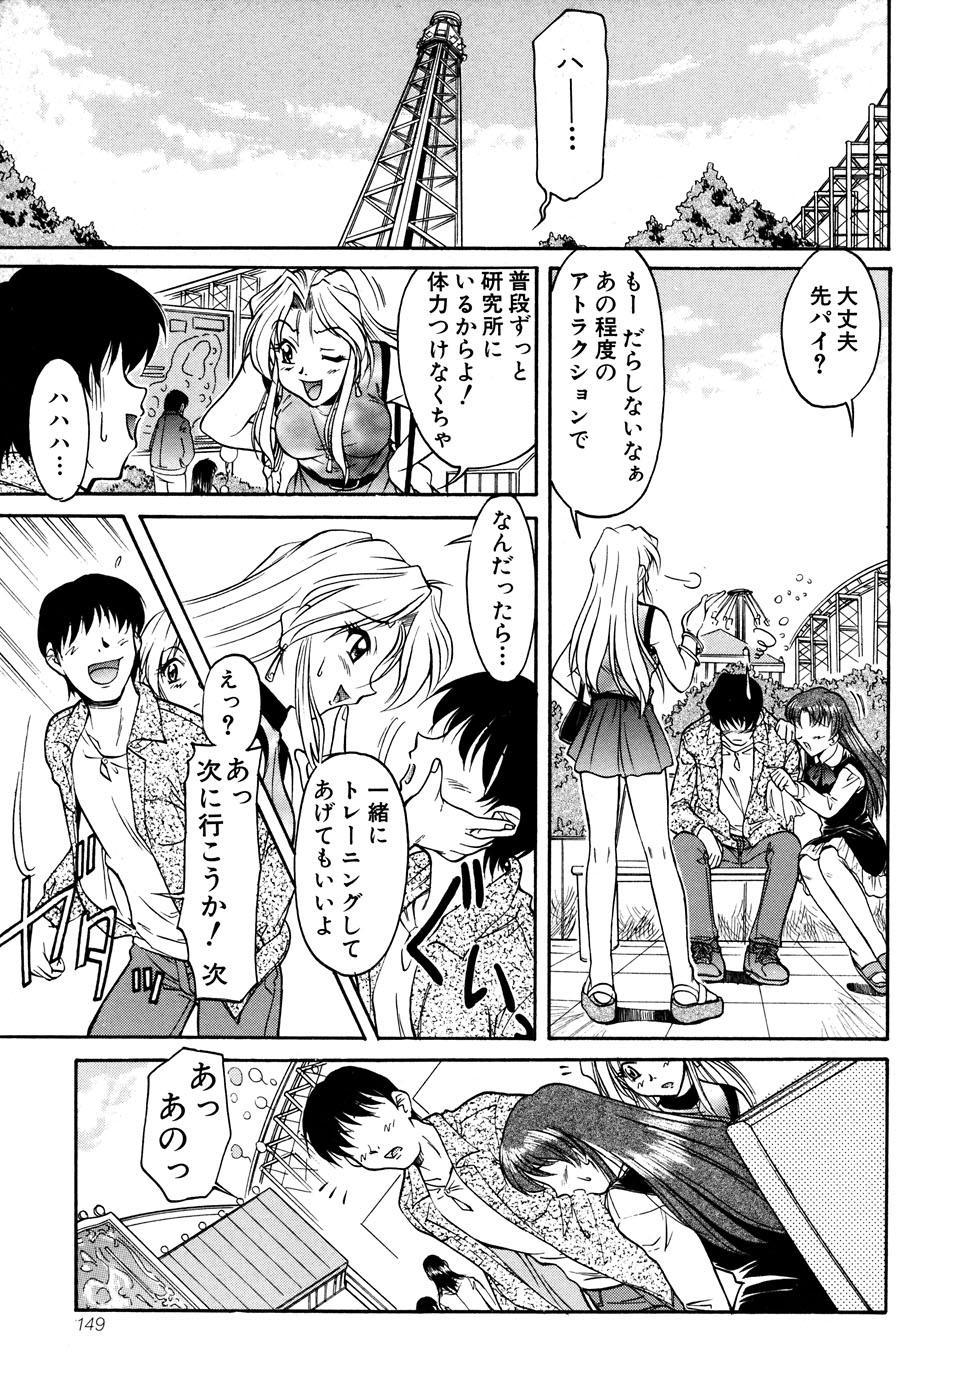 G-drive Vol.1 Ryoujokuhen 148